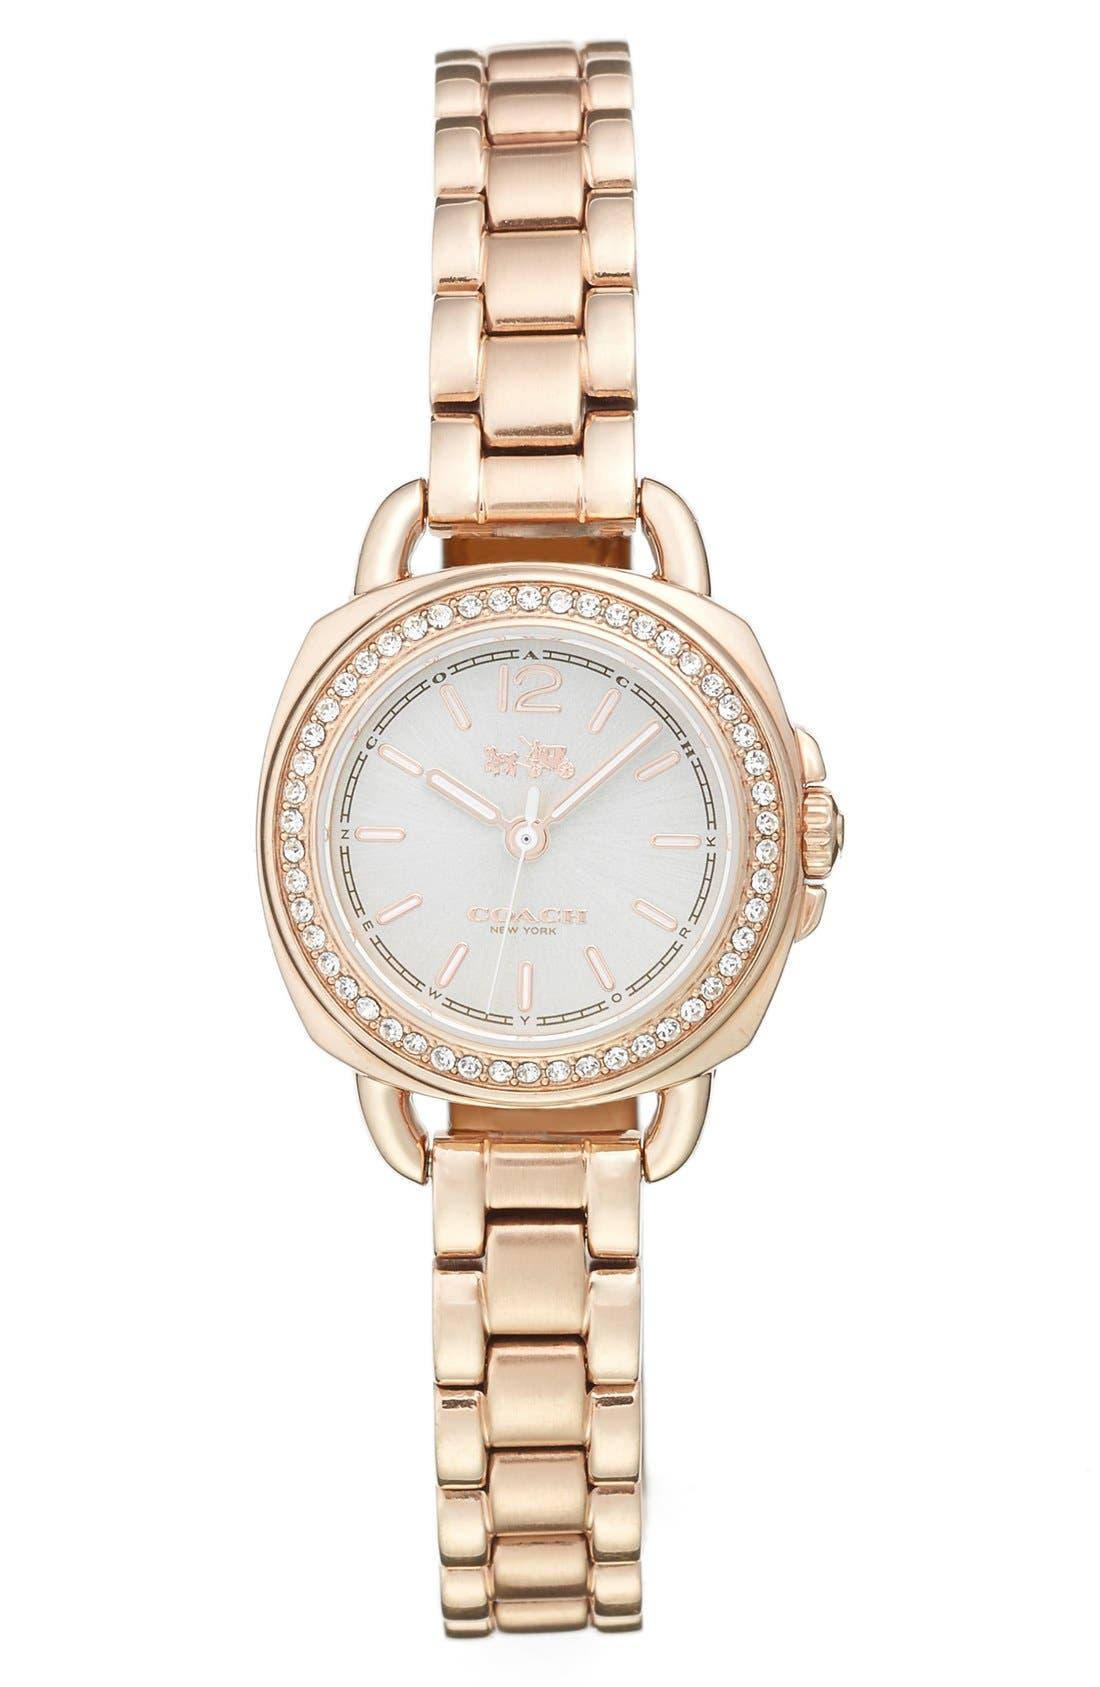 Main Image - Coach 'Tatum' Crystal Bezel Bracelet Watch, 24mm